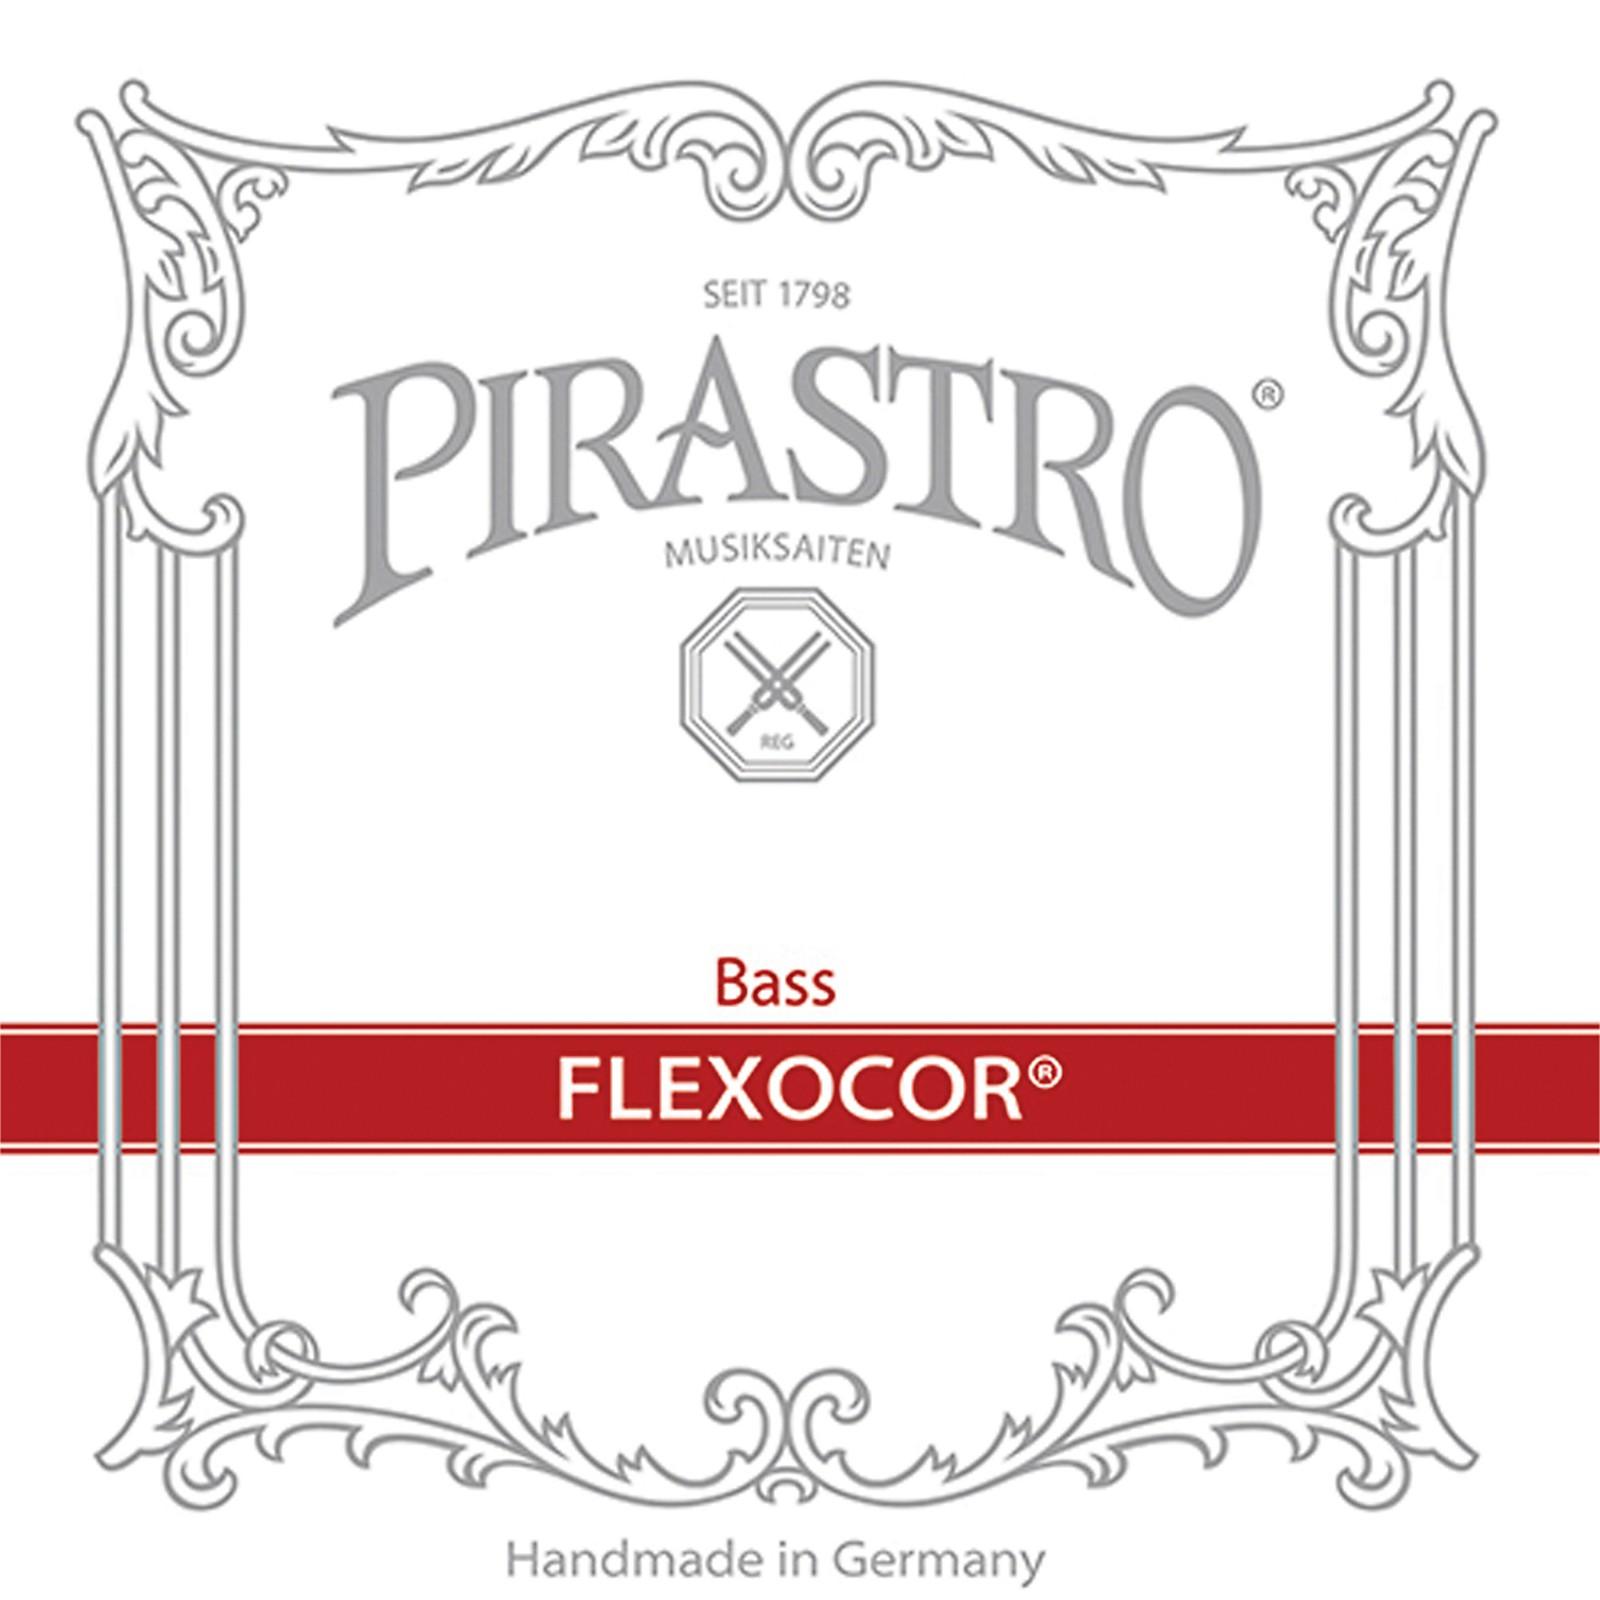 Pirastro Flexocor Series Double Bass B String